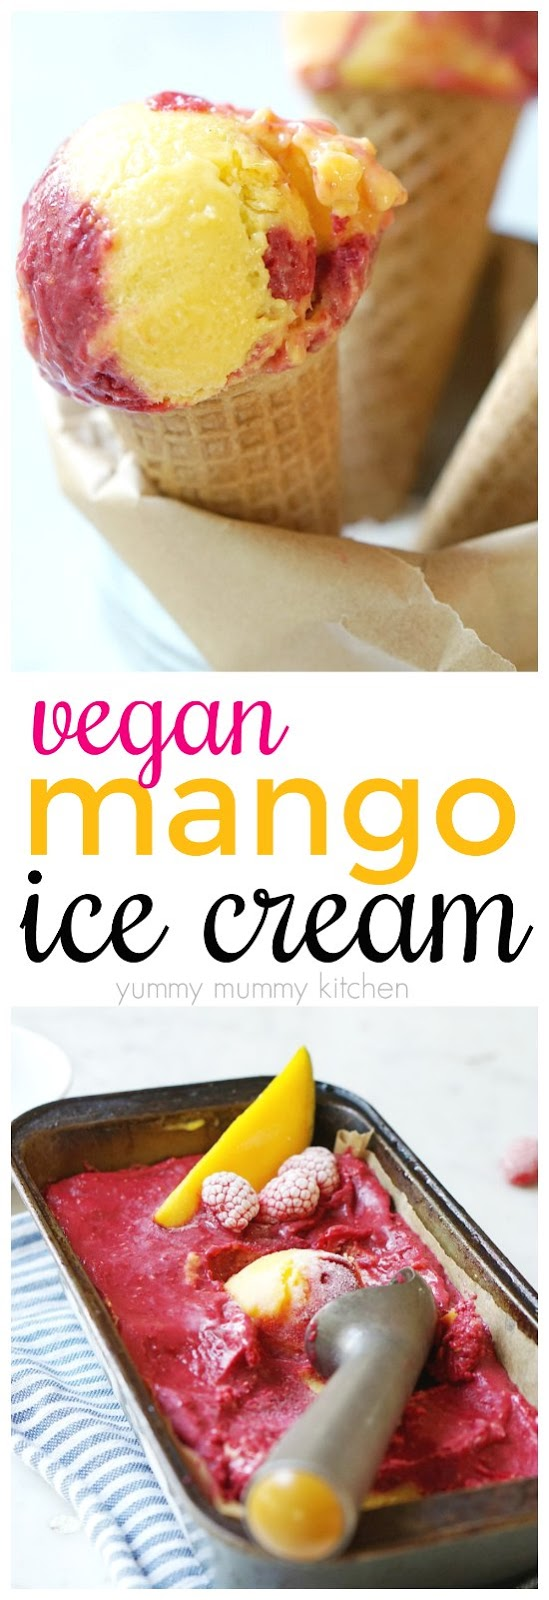 Easy 2-ingredient mango and raspberry swirled vegan ice cream recipe. This nice cream is easy to make in the food processor or Vitamix.